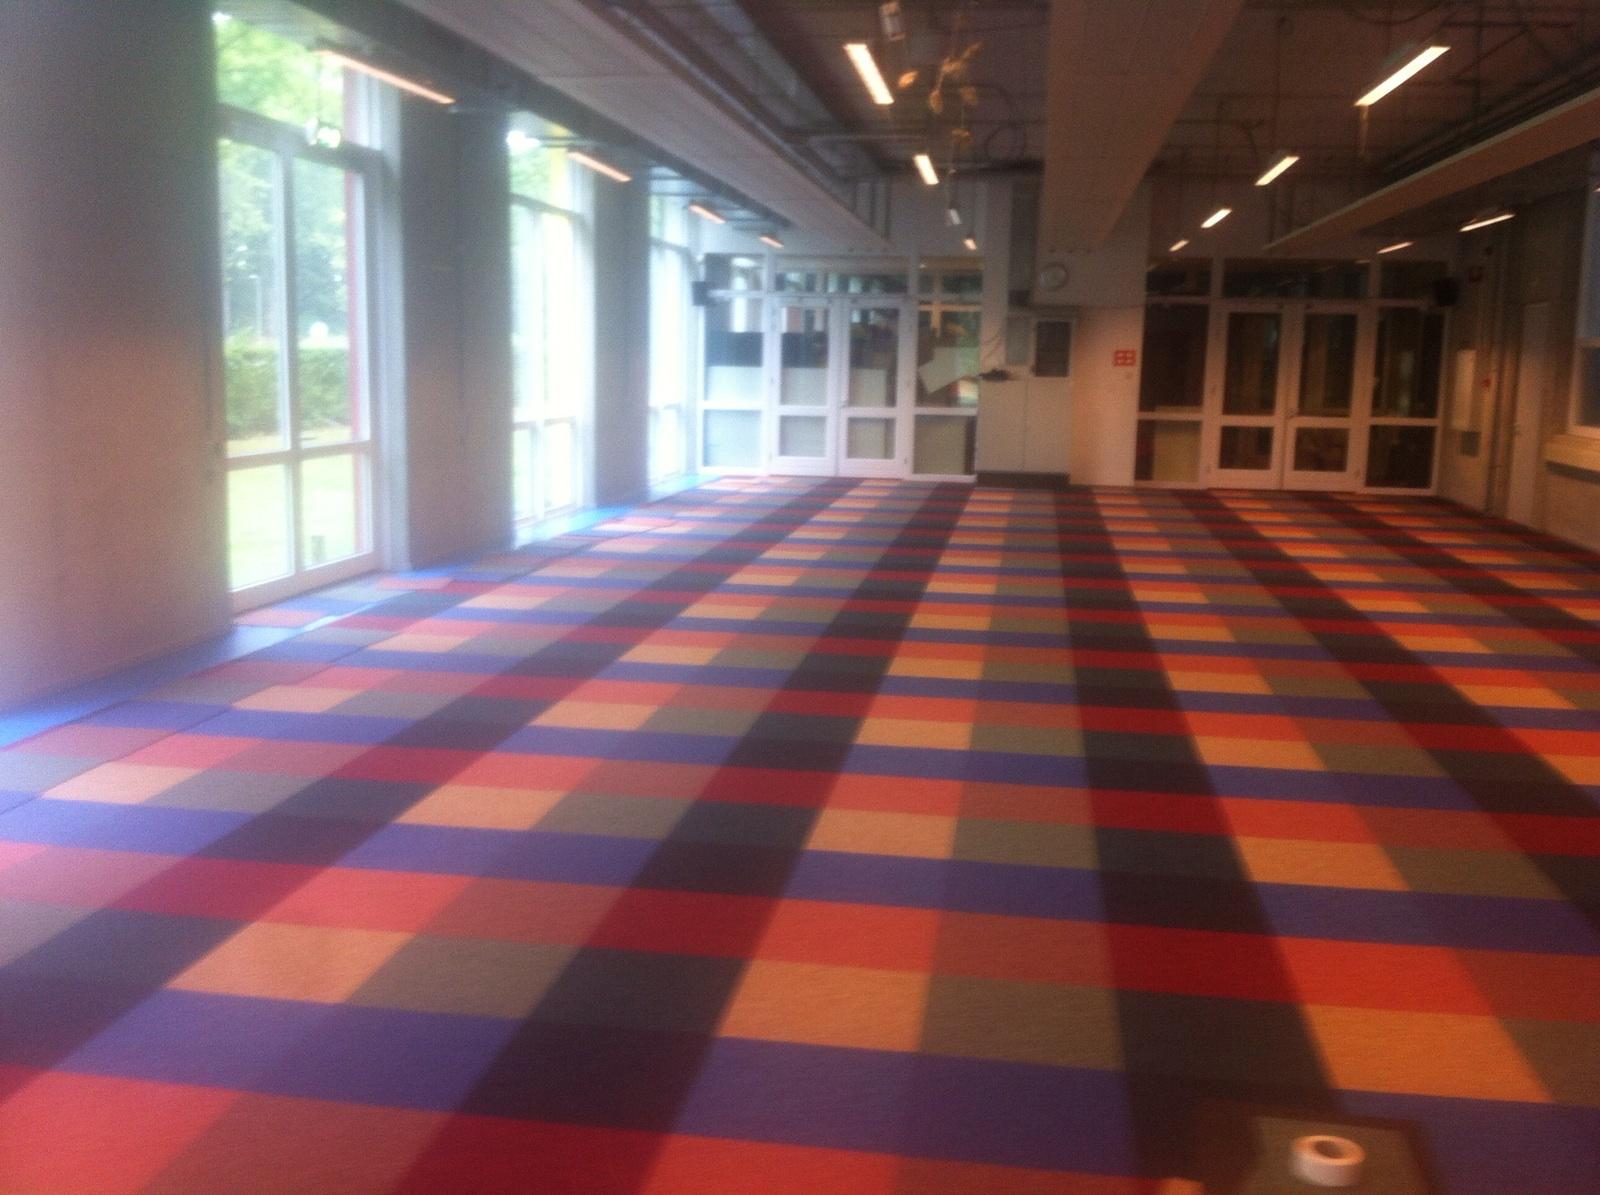 Houten Vloeren Roermond : Massief houten vloer zwevend leggen vloeren jos habraken zwevend